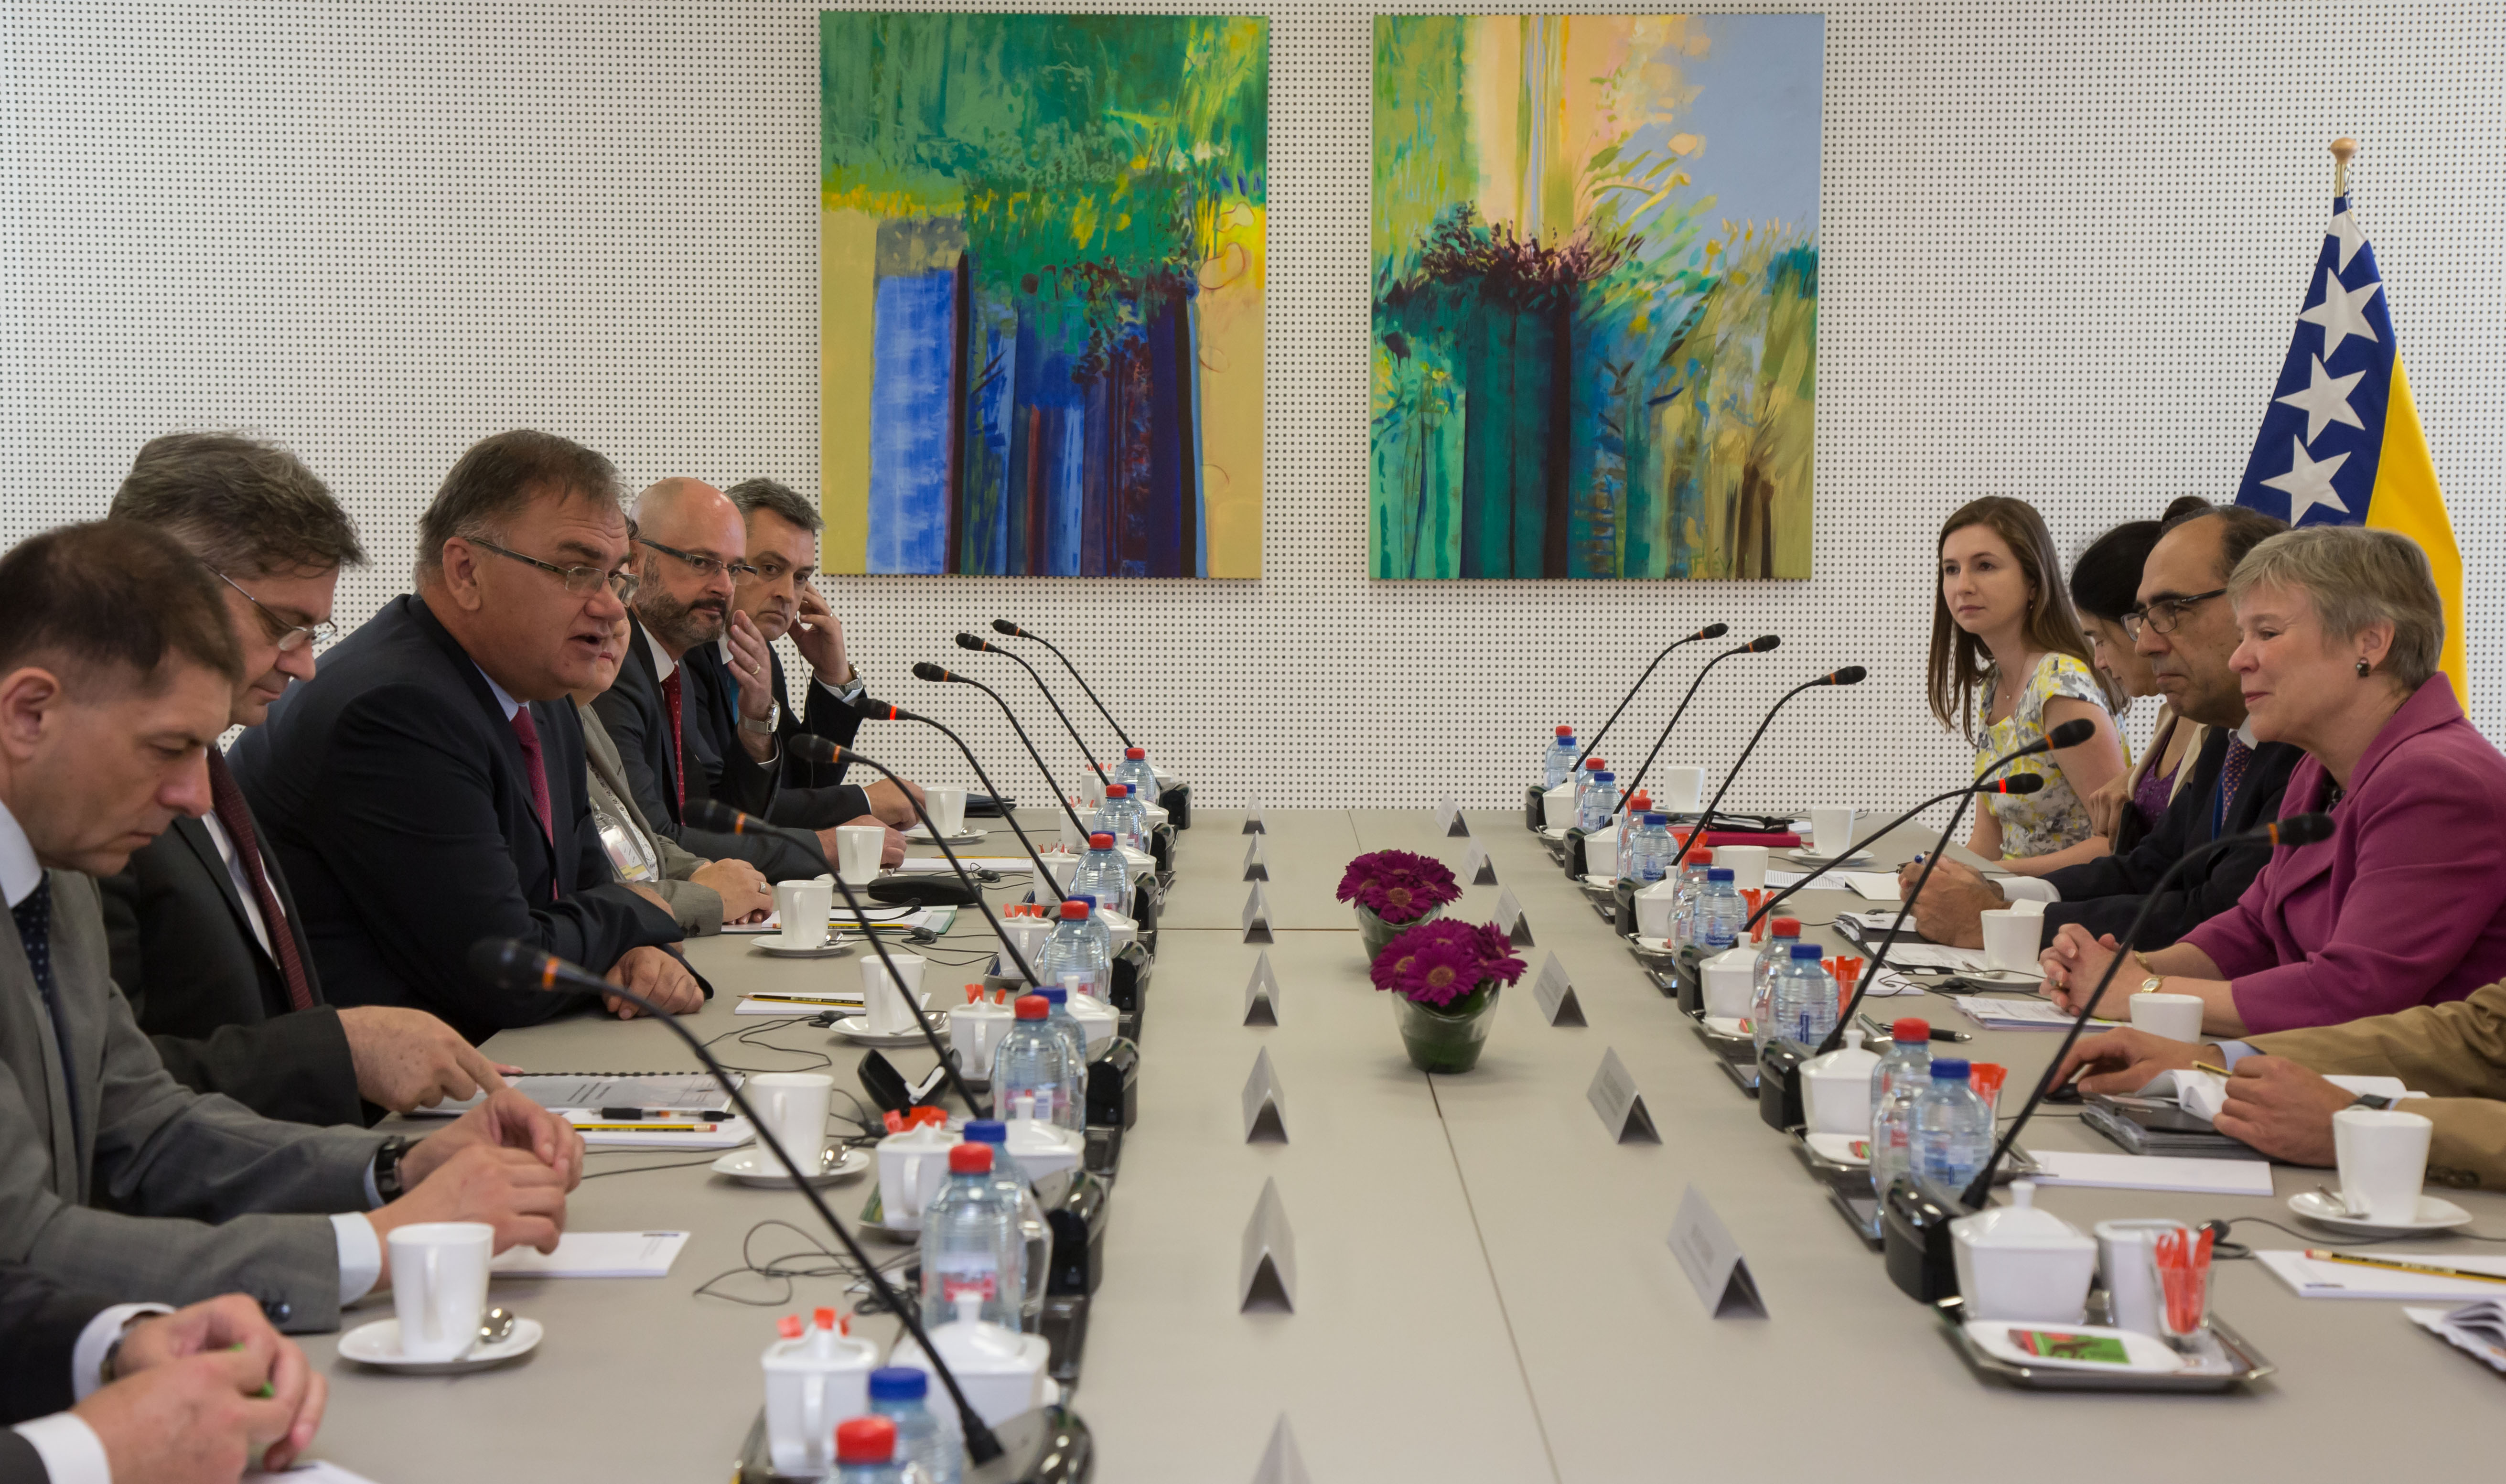 BiH has no consensus on NATO membership